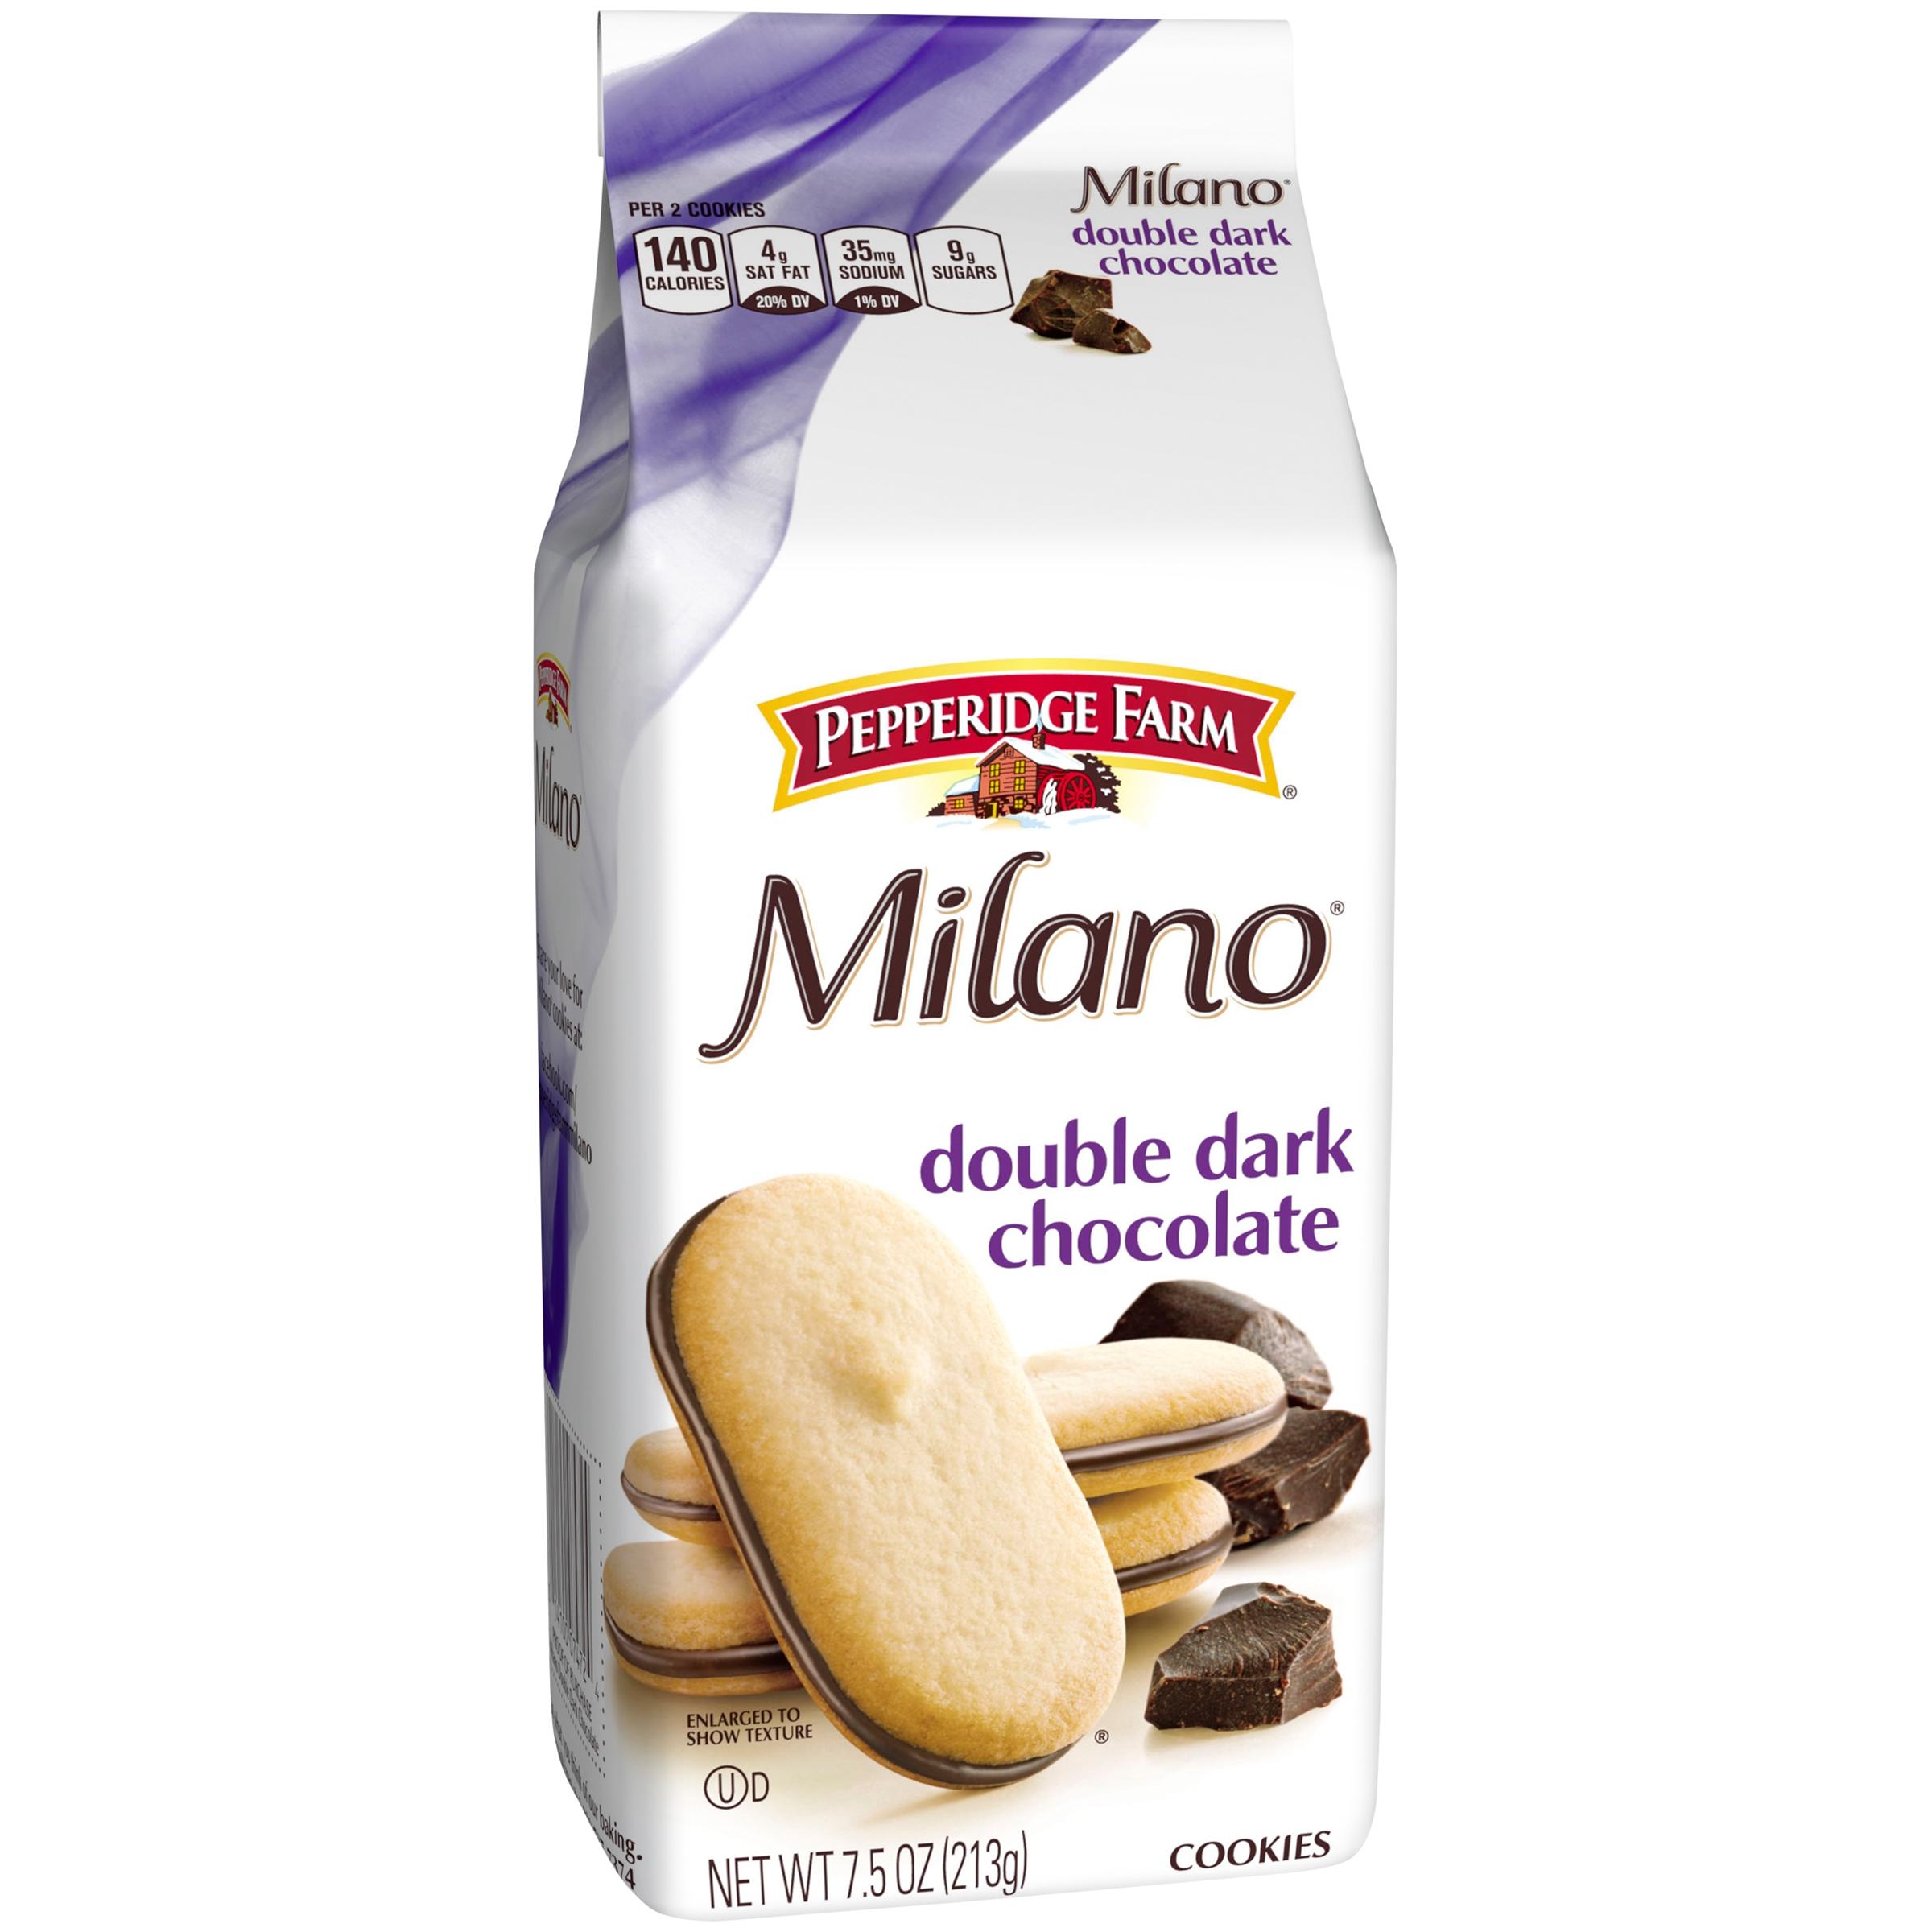 Milano Double Dark Chocolate Cookies - 7.5oz - Pepperidge Farm